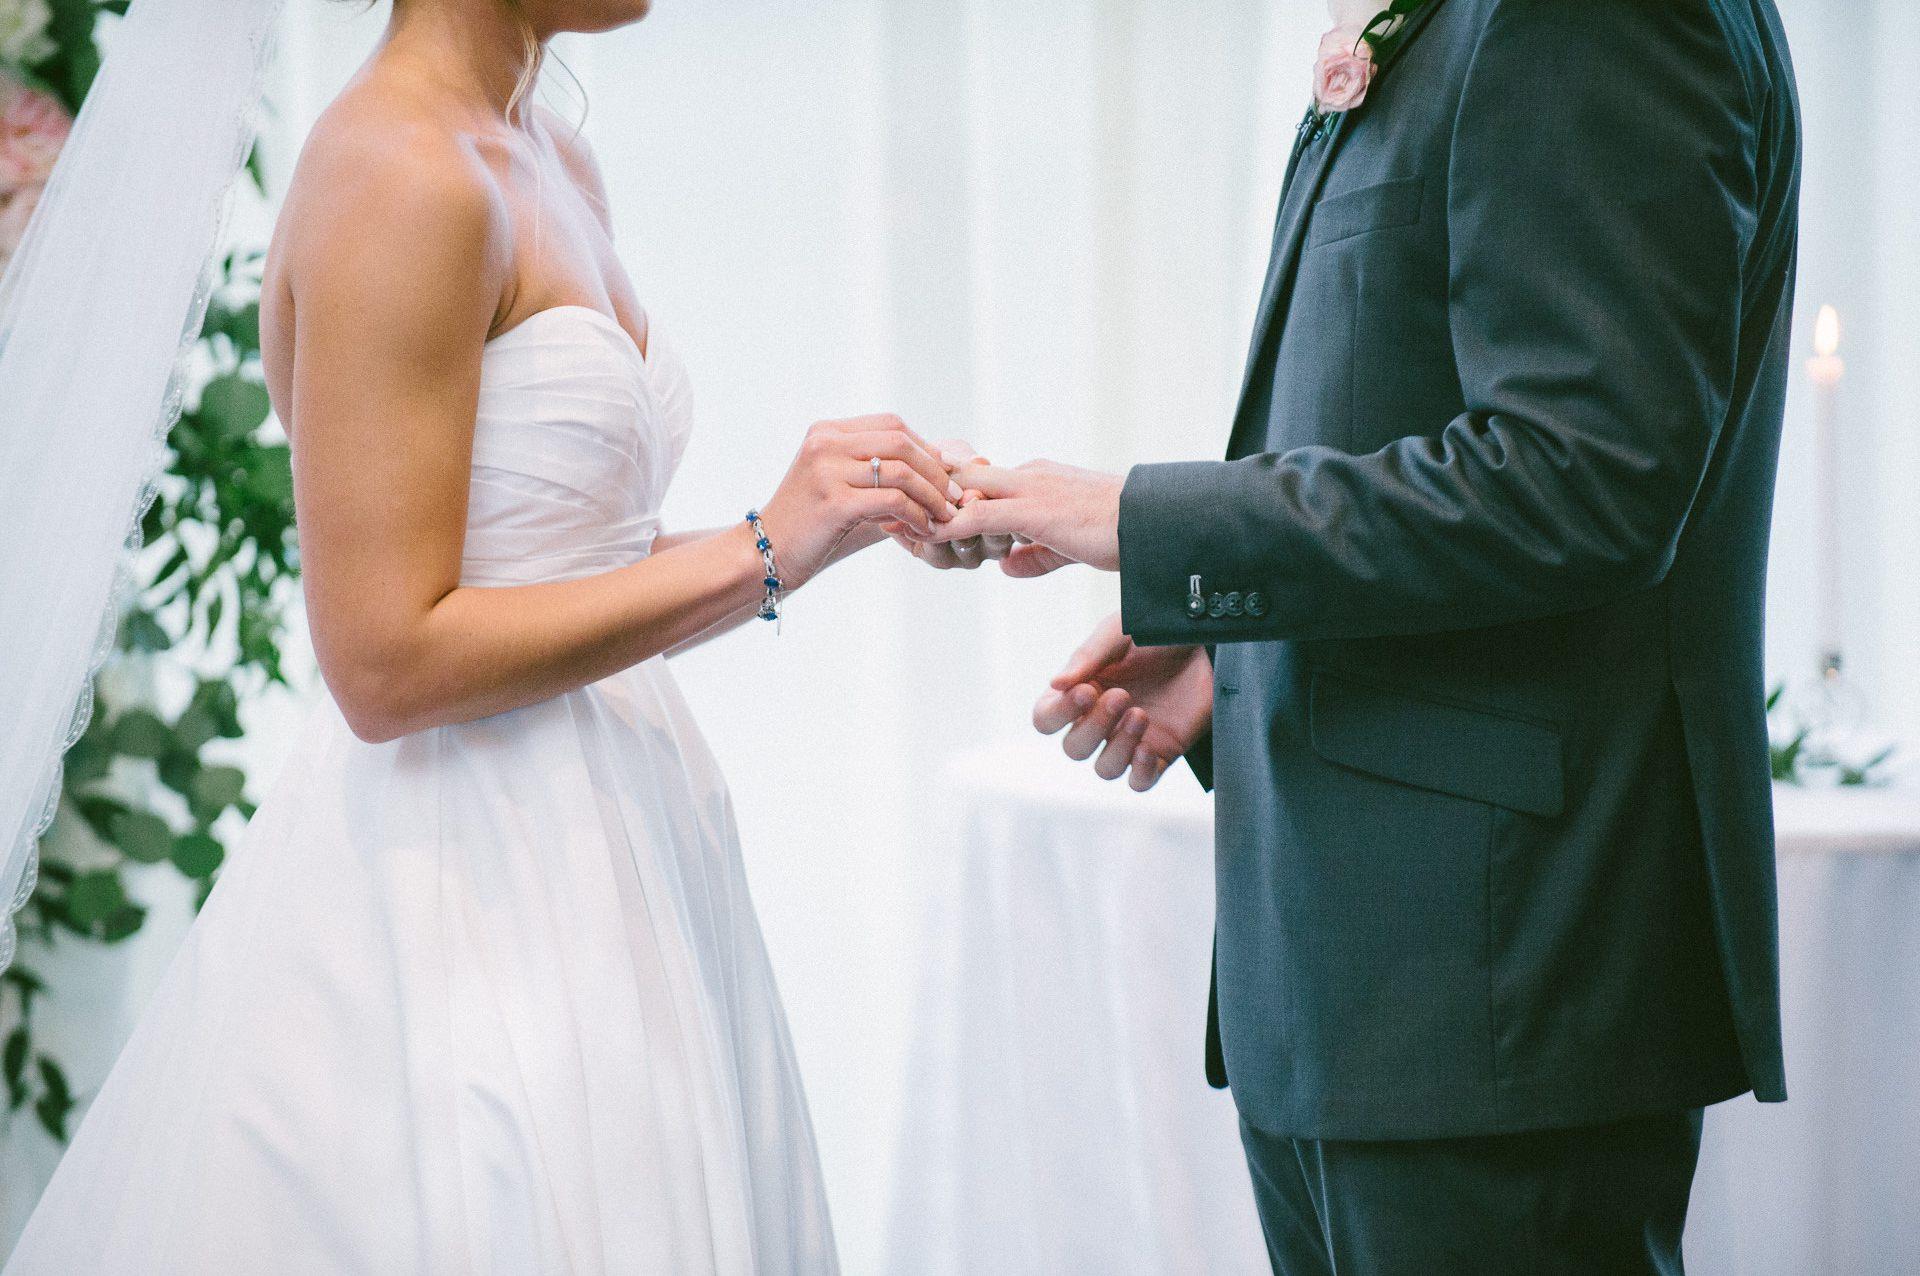 Dowtown Hilton Cleveland Wedding Photographer 2 13.jpg